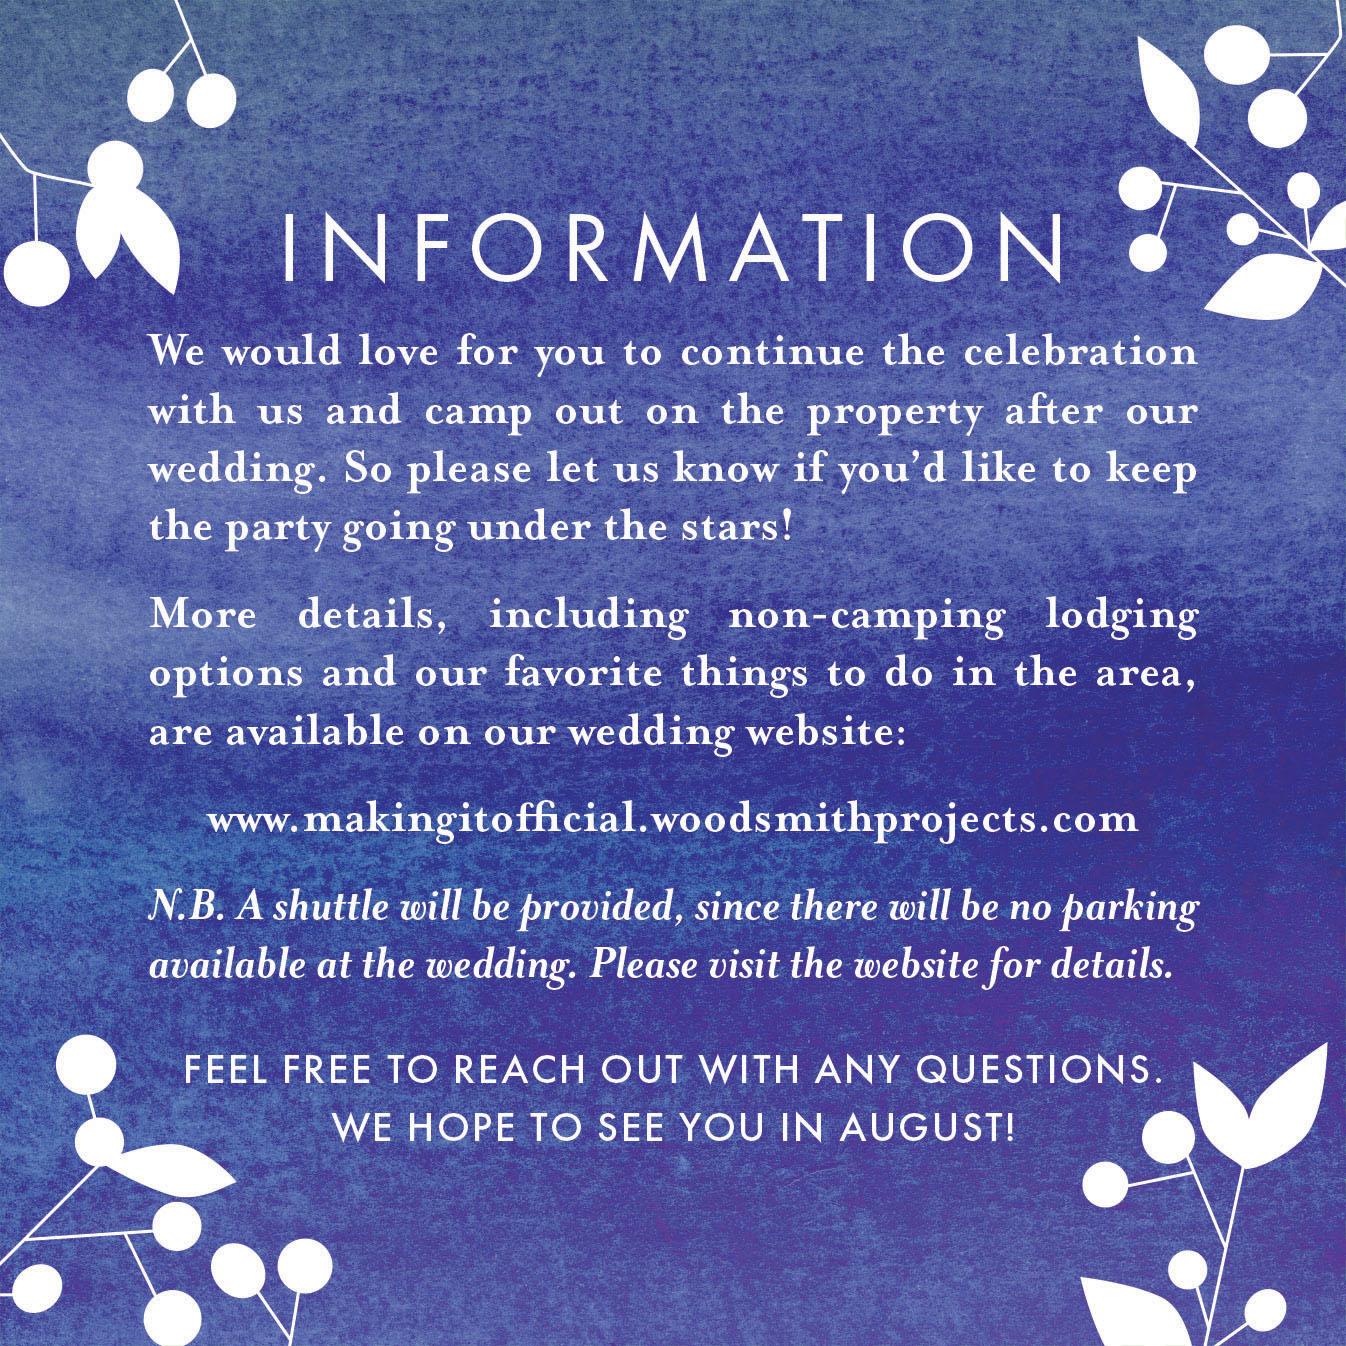 Smith-Wood Wedding, Info Card